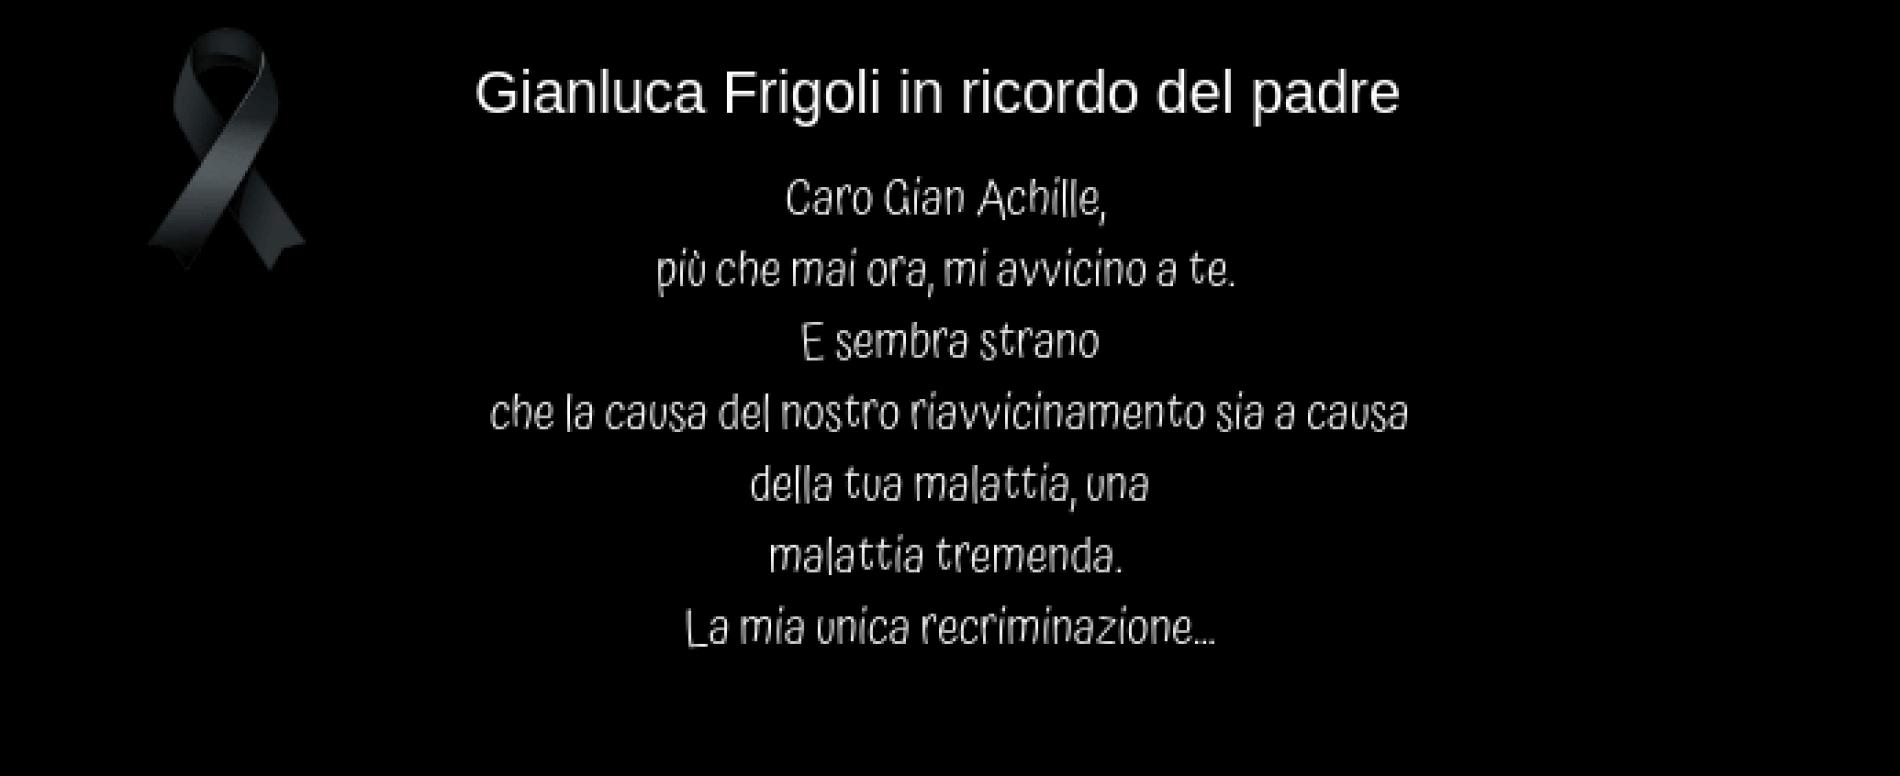 Gianluca Frigoli in ricordo del papà Gian Achille